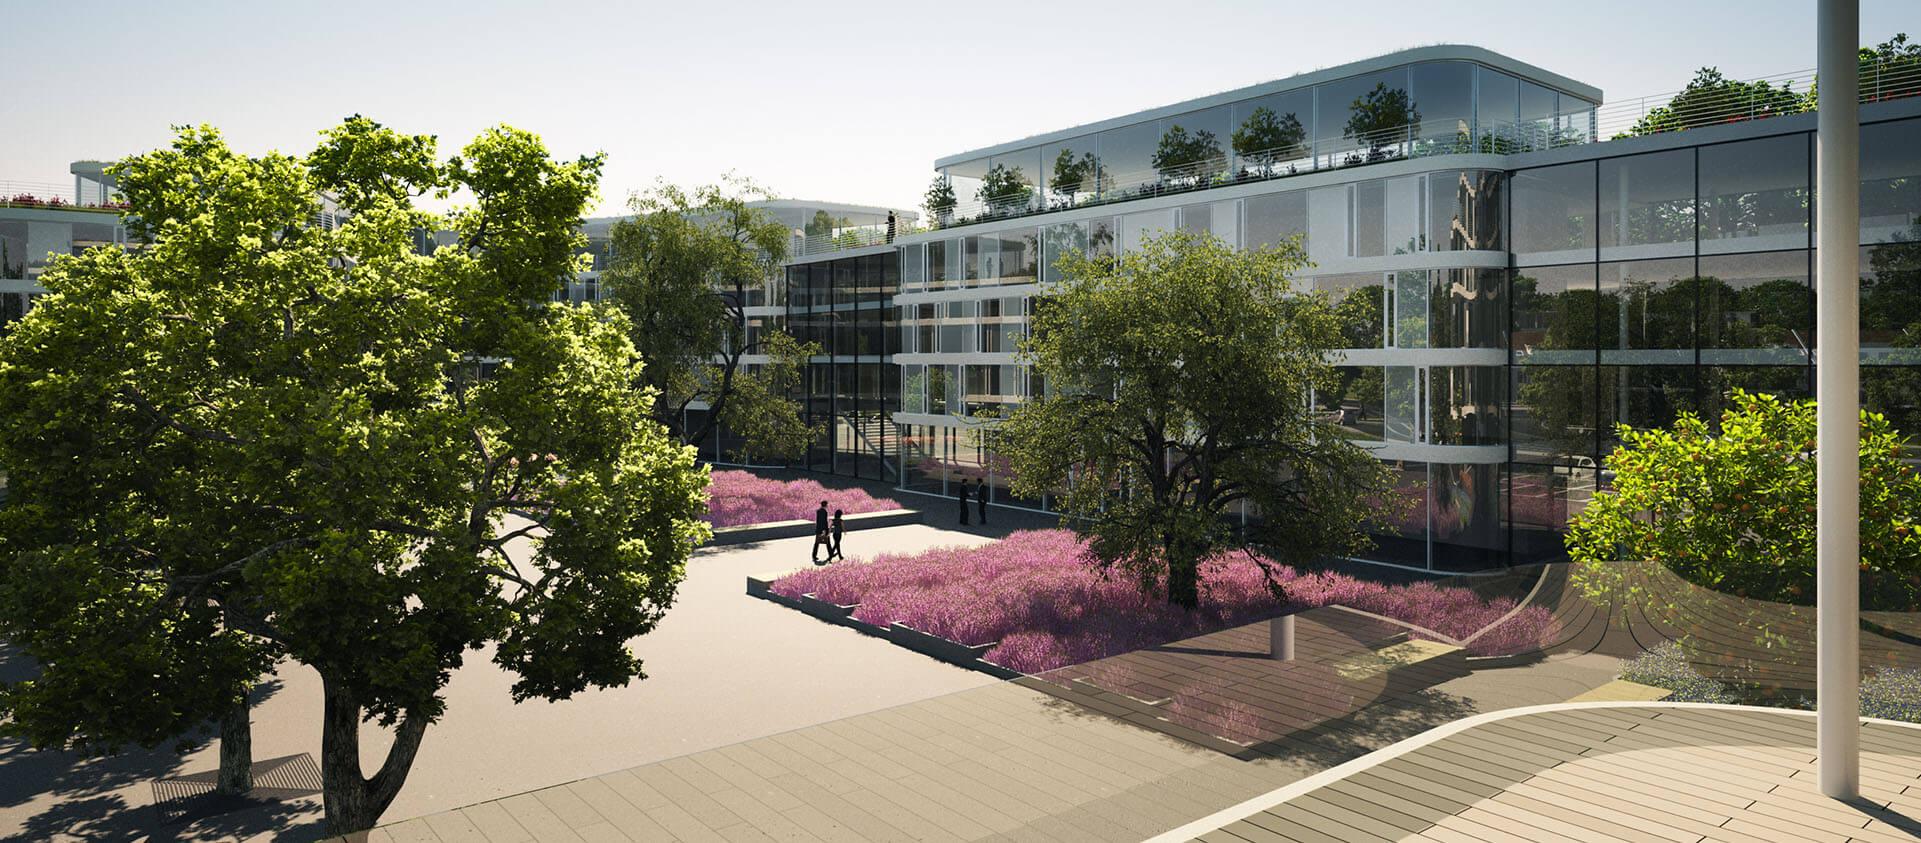 Projektentwicklung Bad Homburg Eberhard Horn Designgruppe, Innenhof Natural Balance Campus